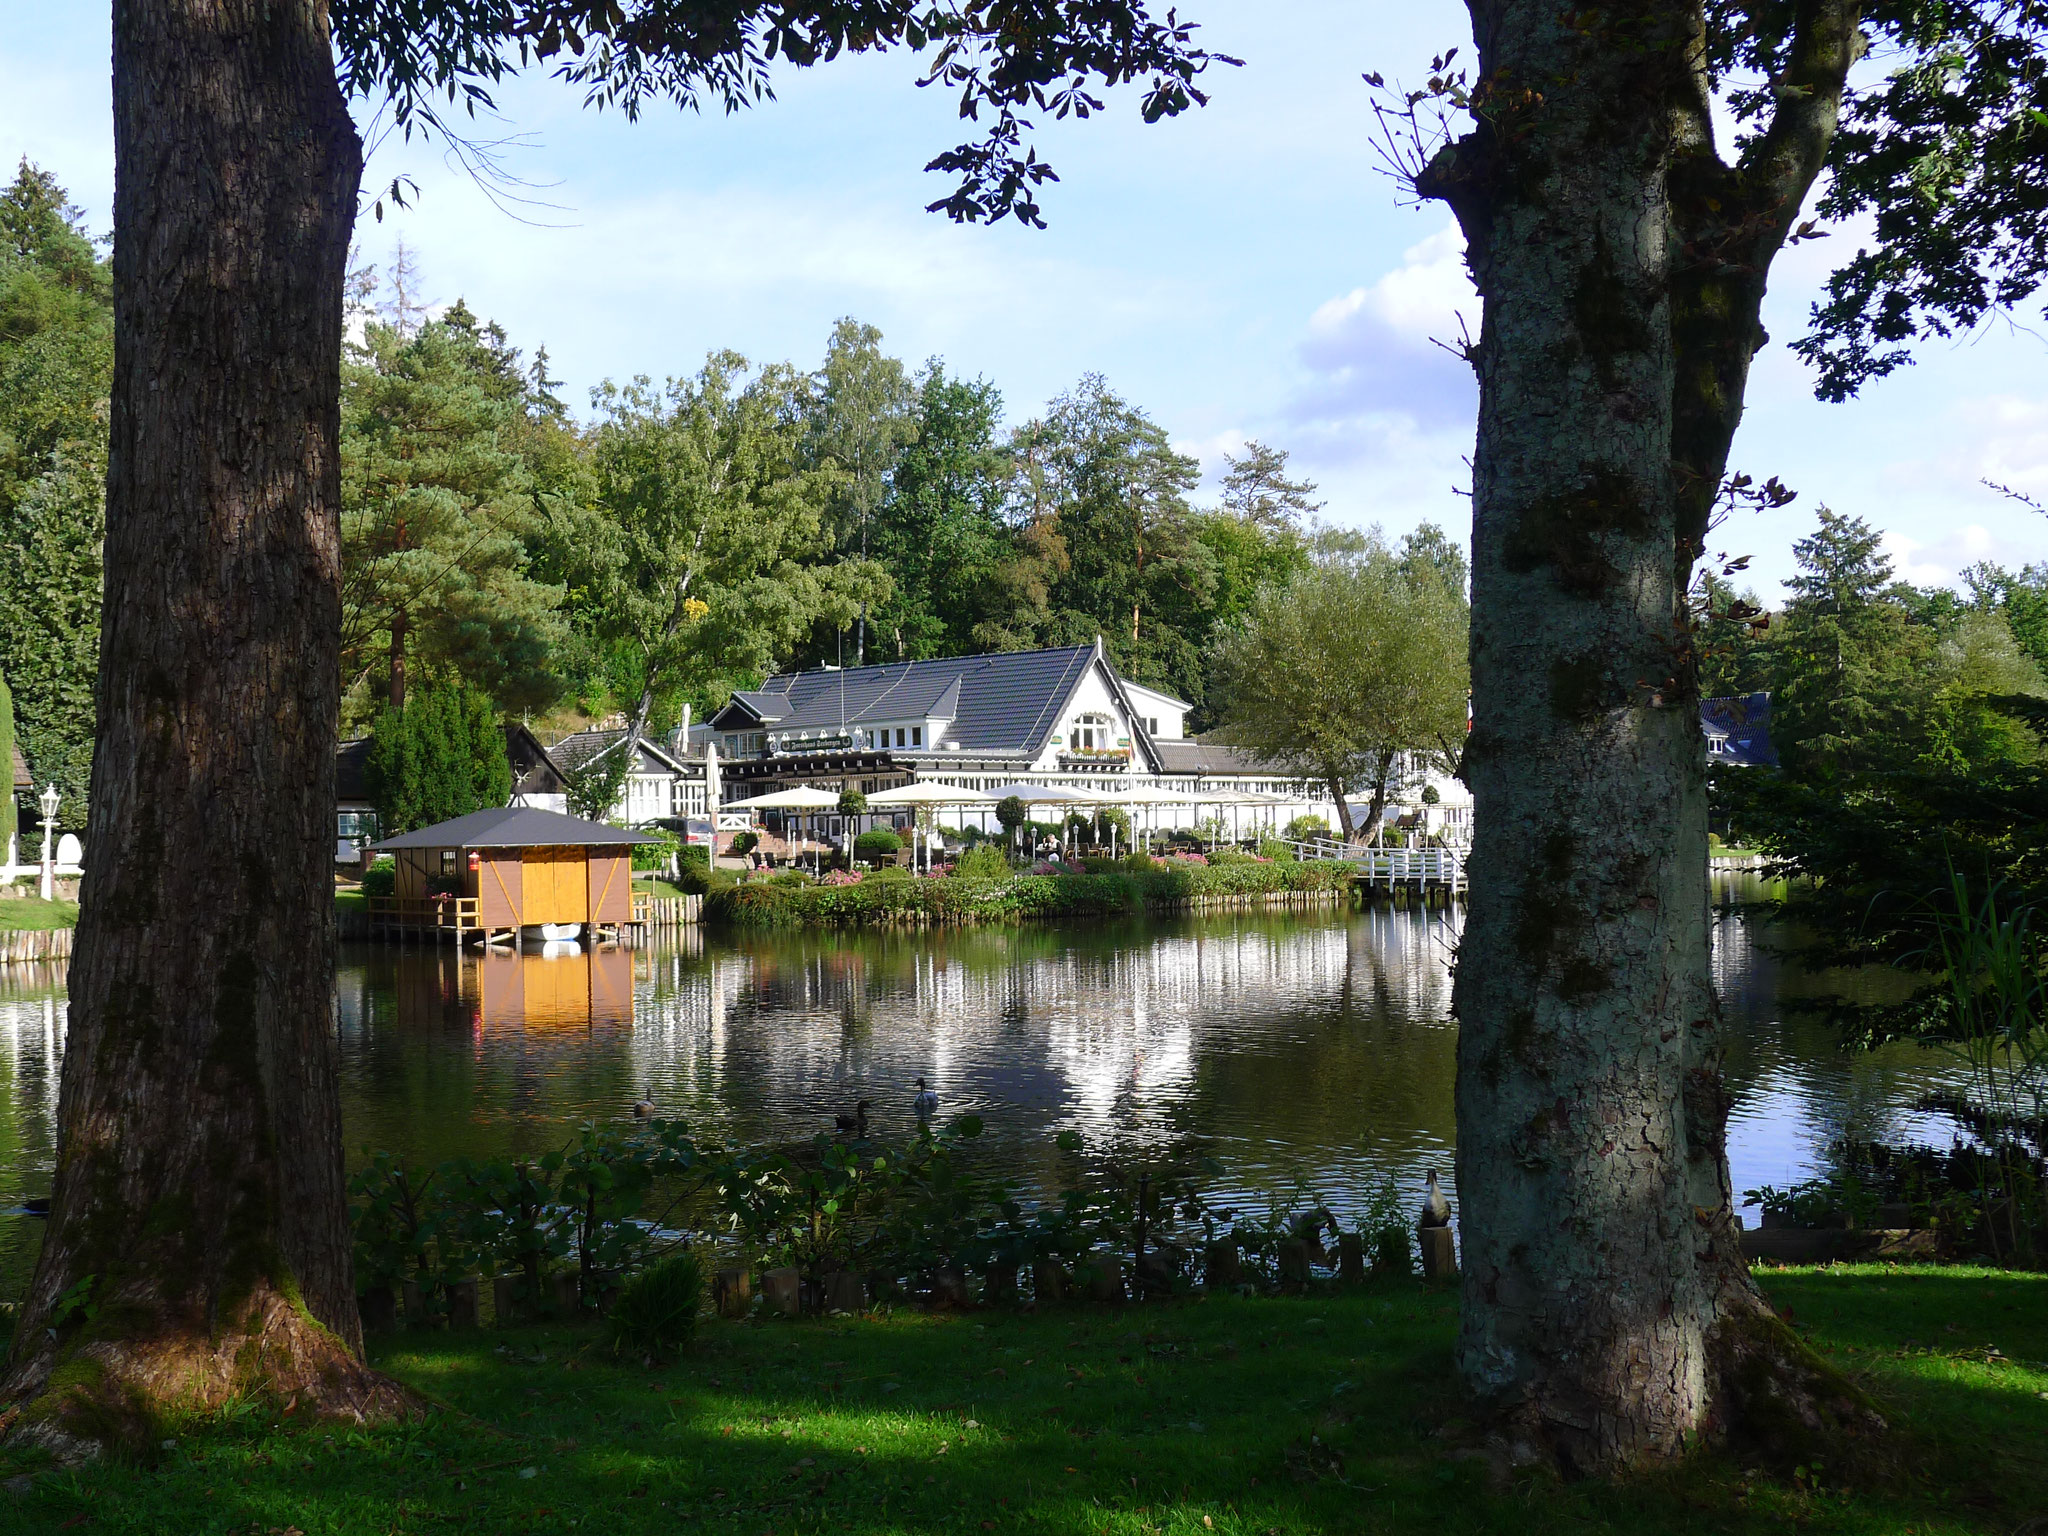 Forsthaus Seebergen am Lütjensee (Foto: Dorit Hartz)